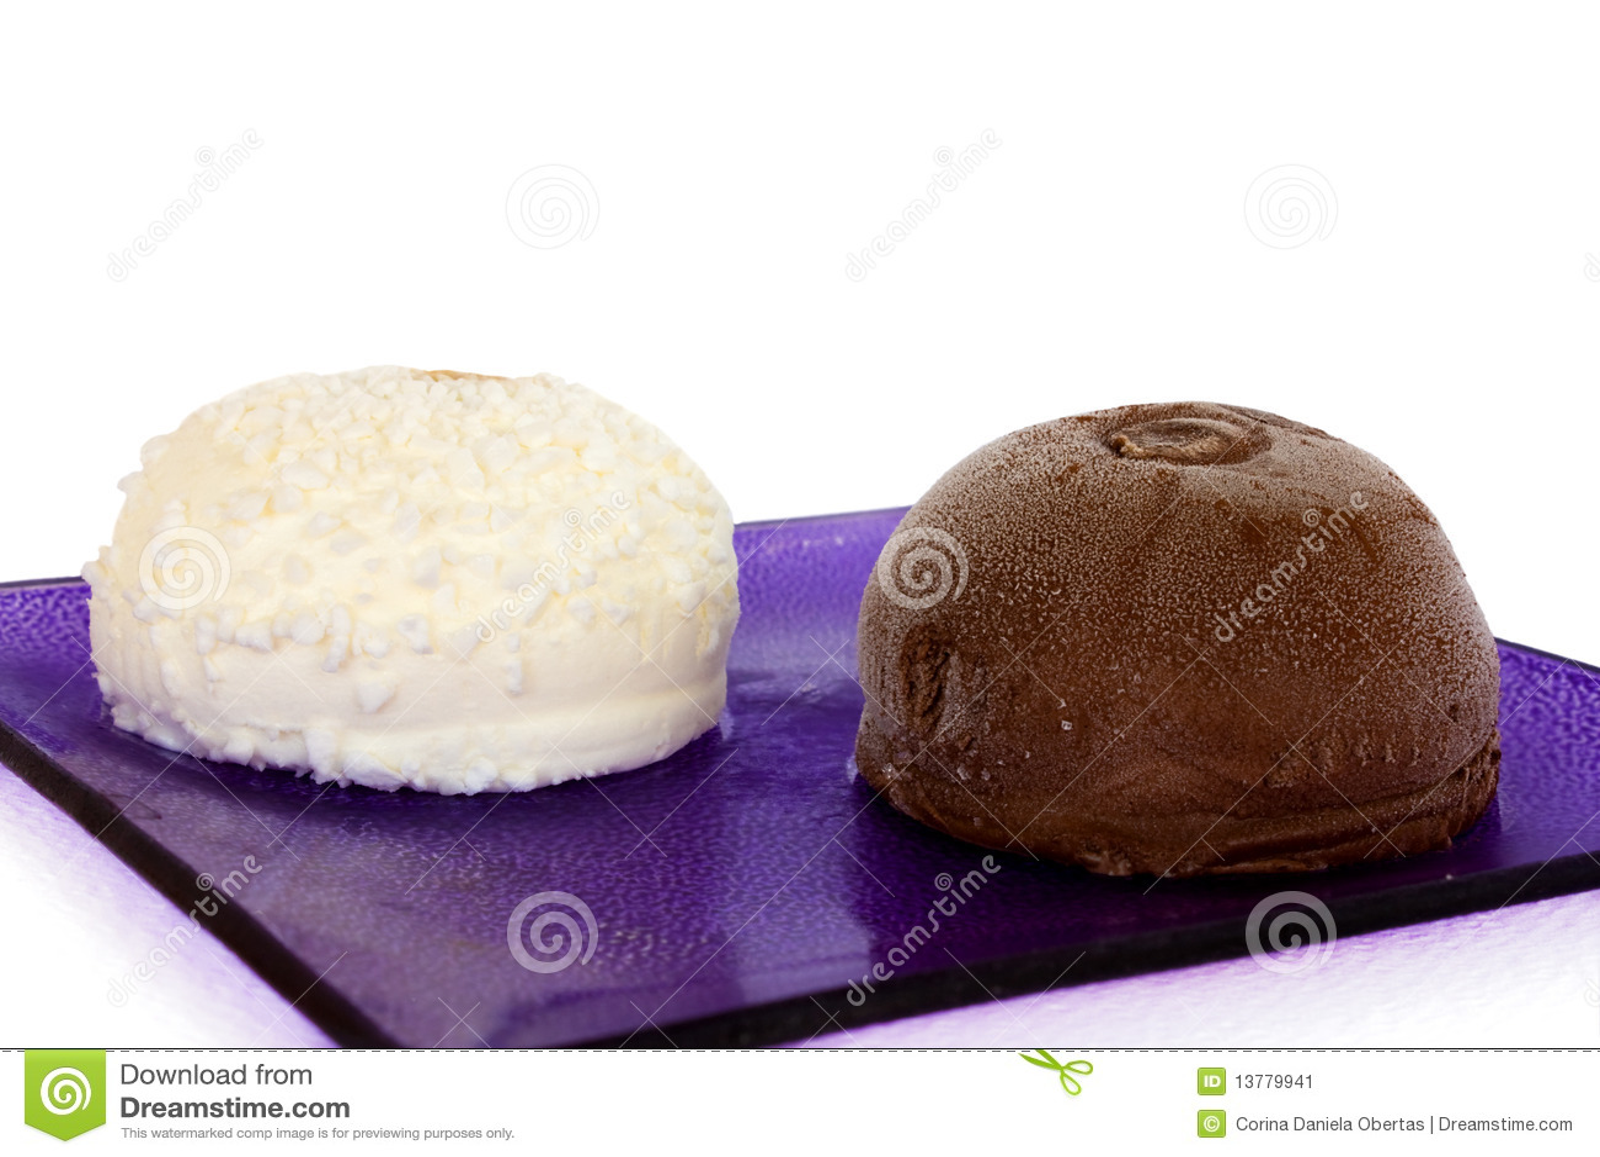 Italian Ice Cream - Truffles Stock Image - Image: 13779941